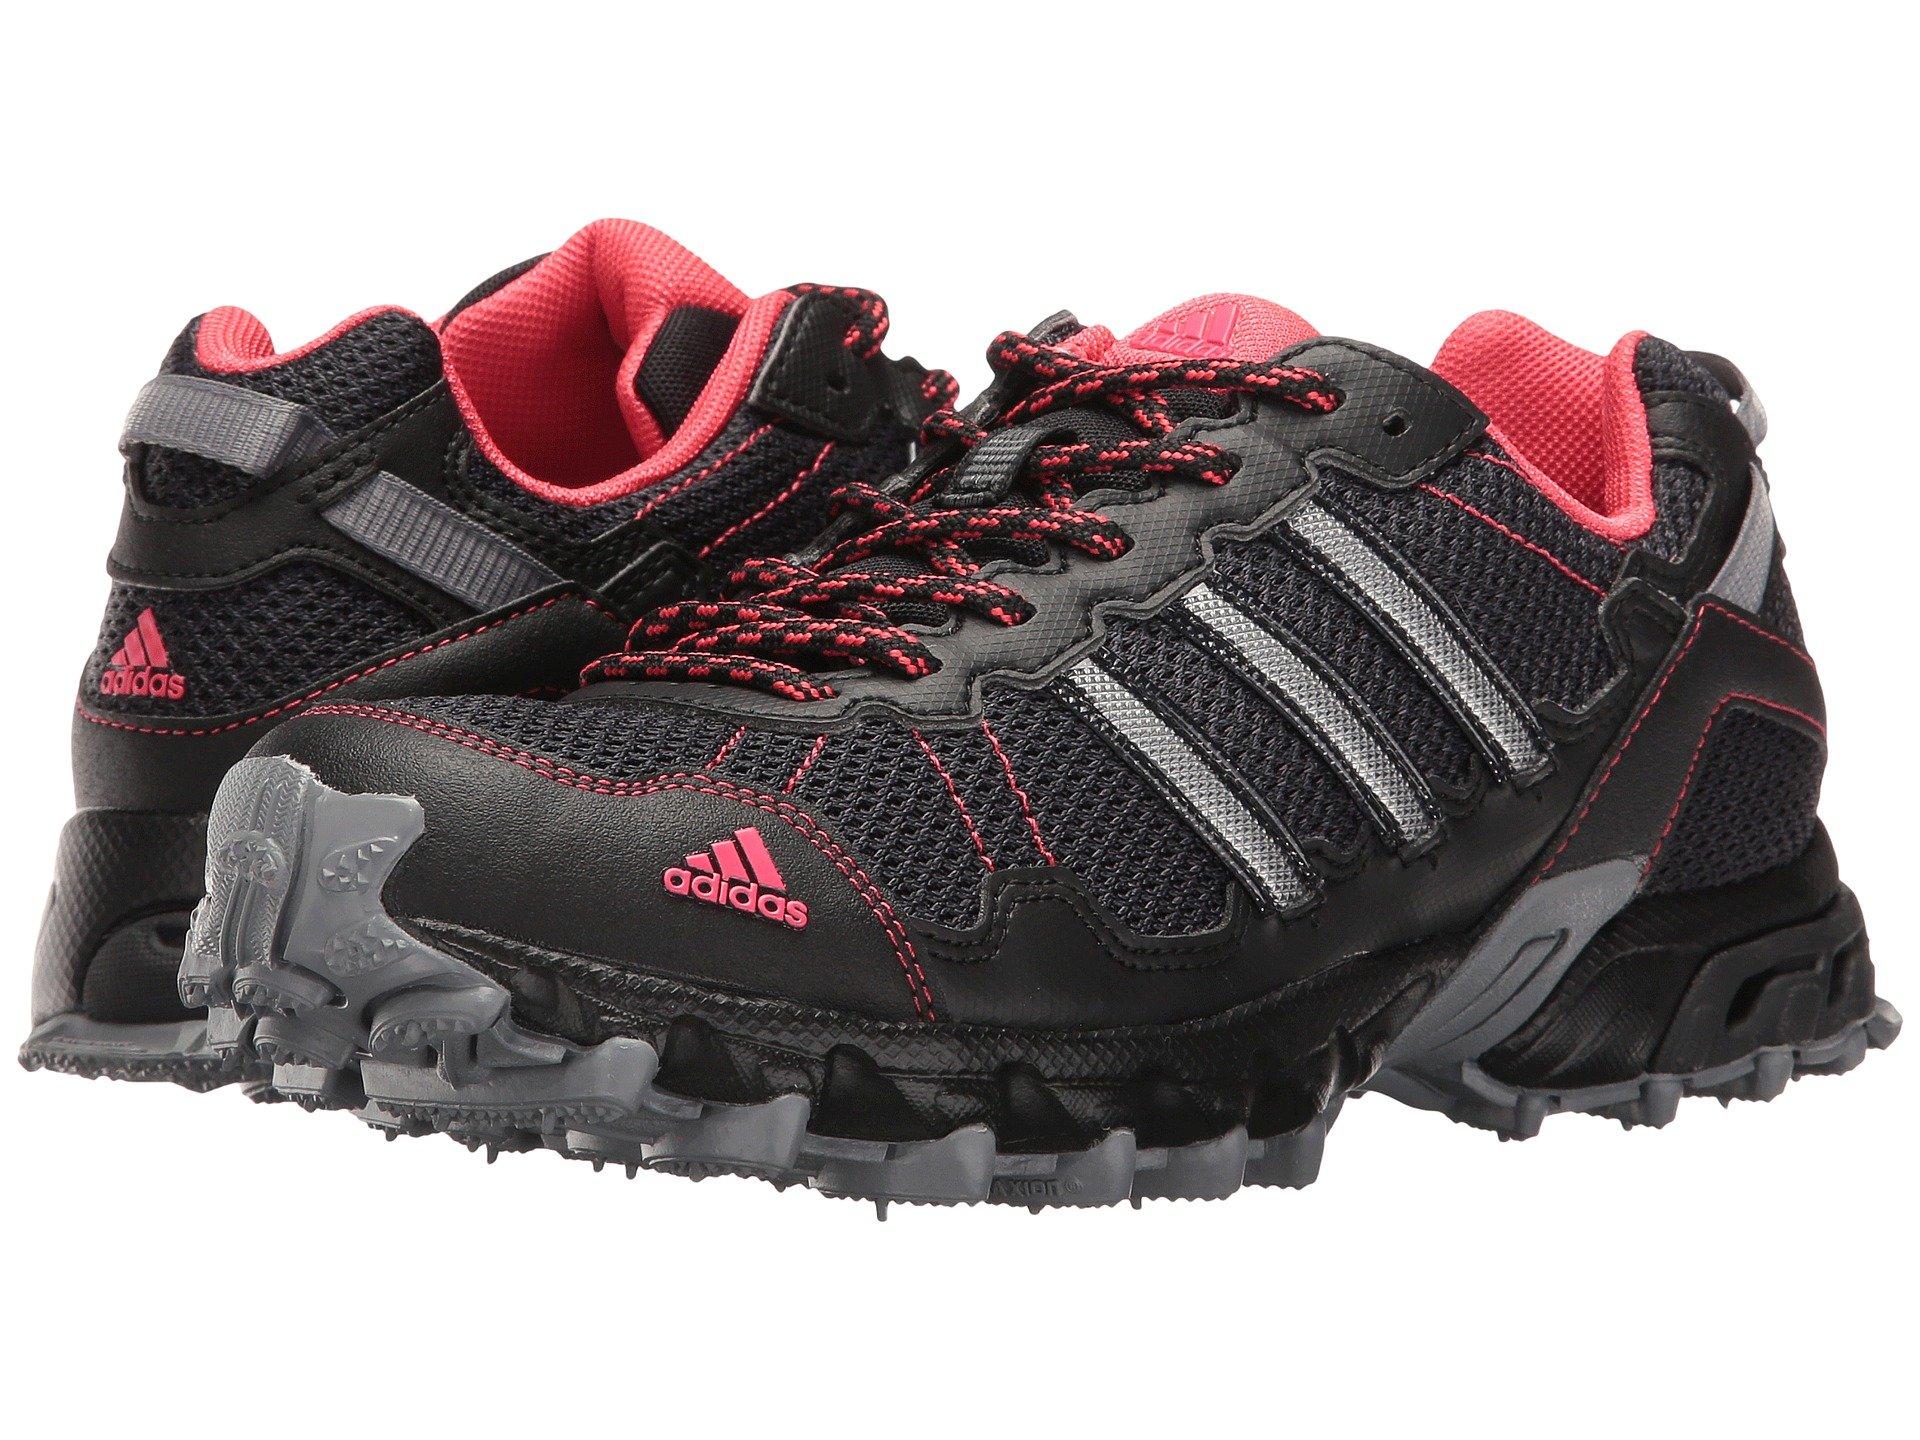 62ddd7c5b2de Adidas Running Rockadia Trail At